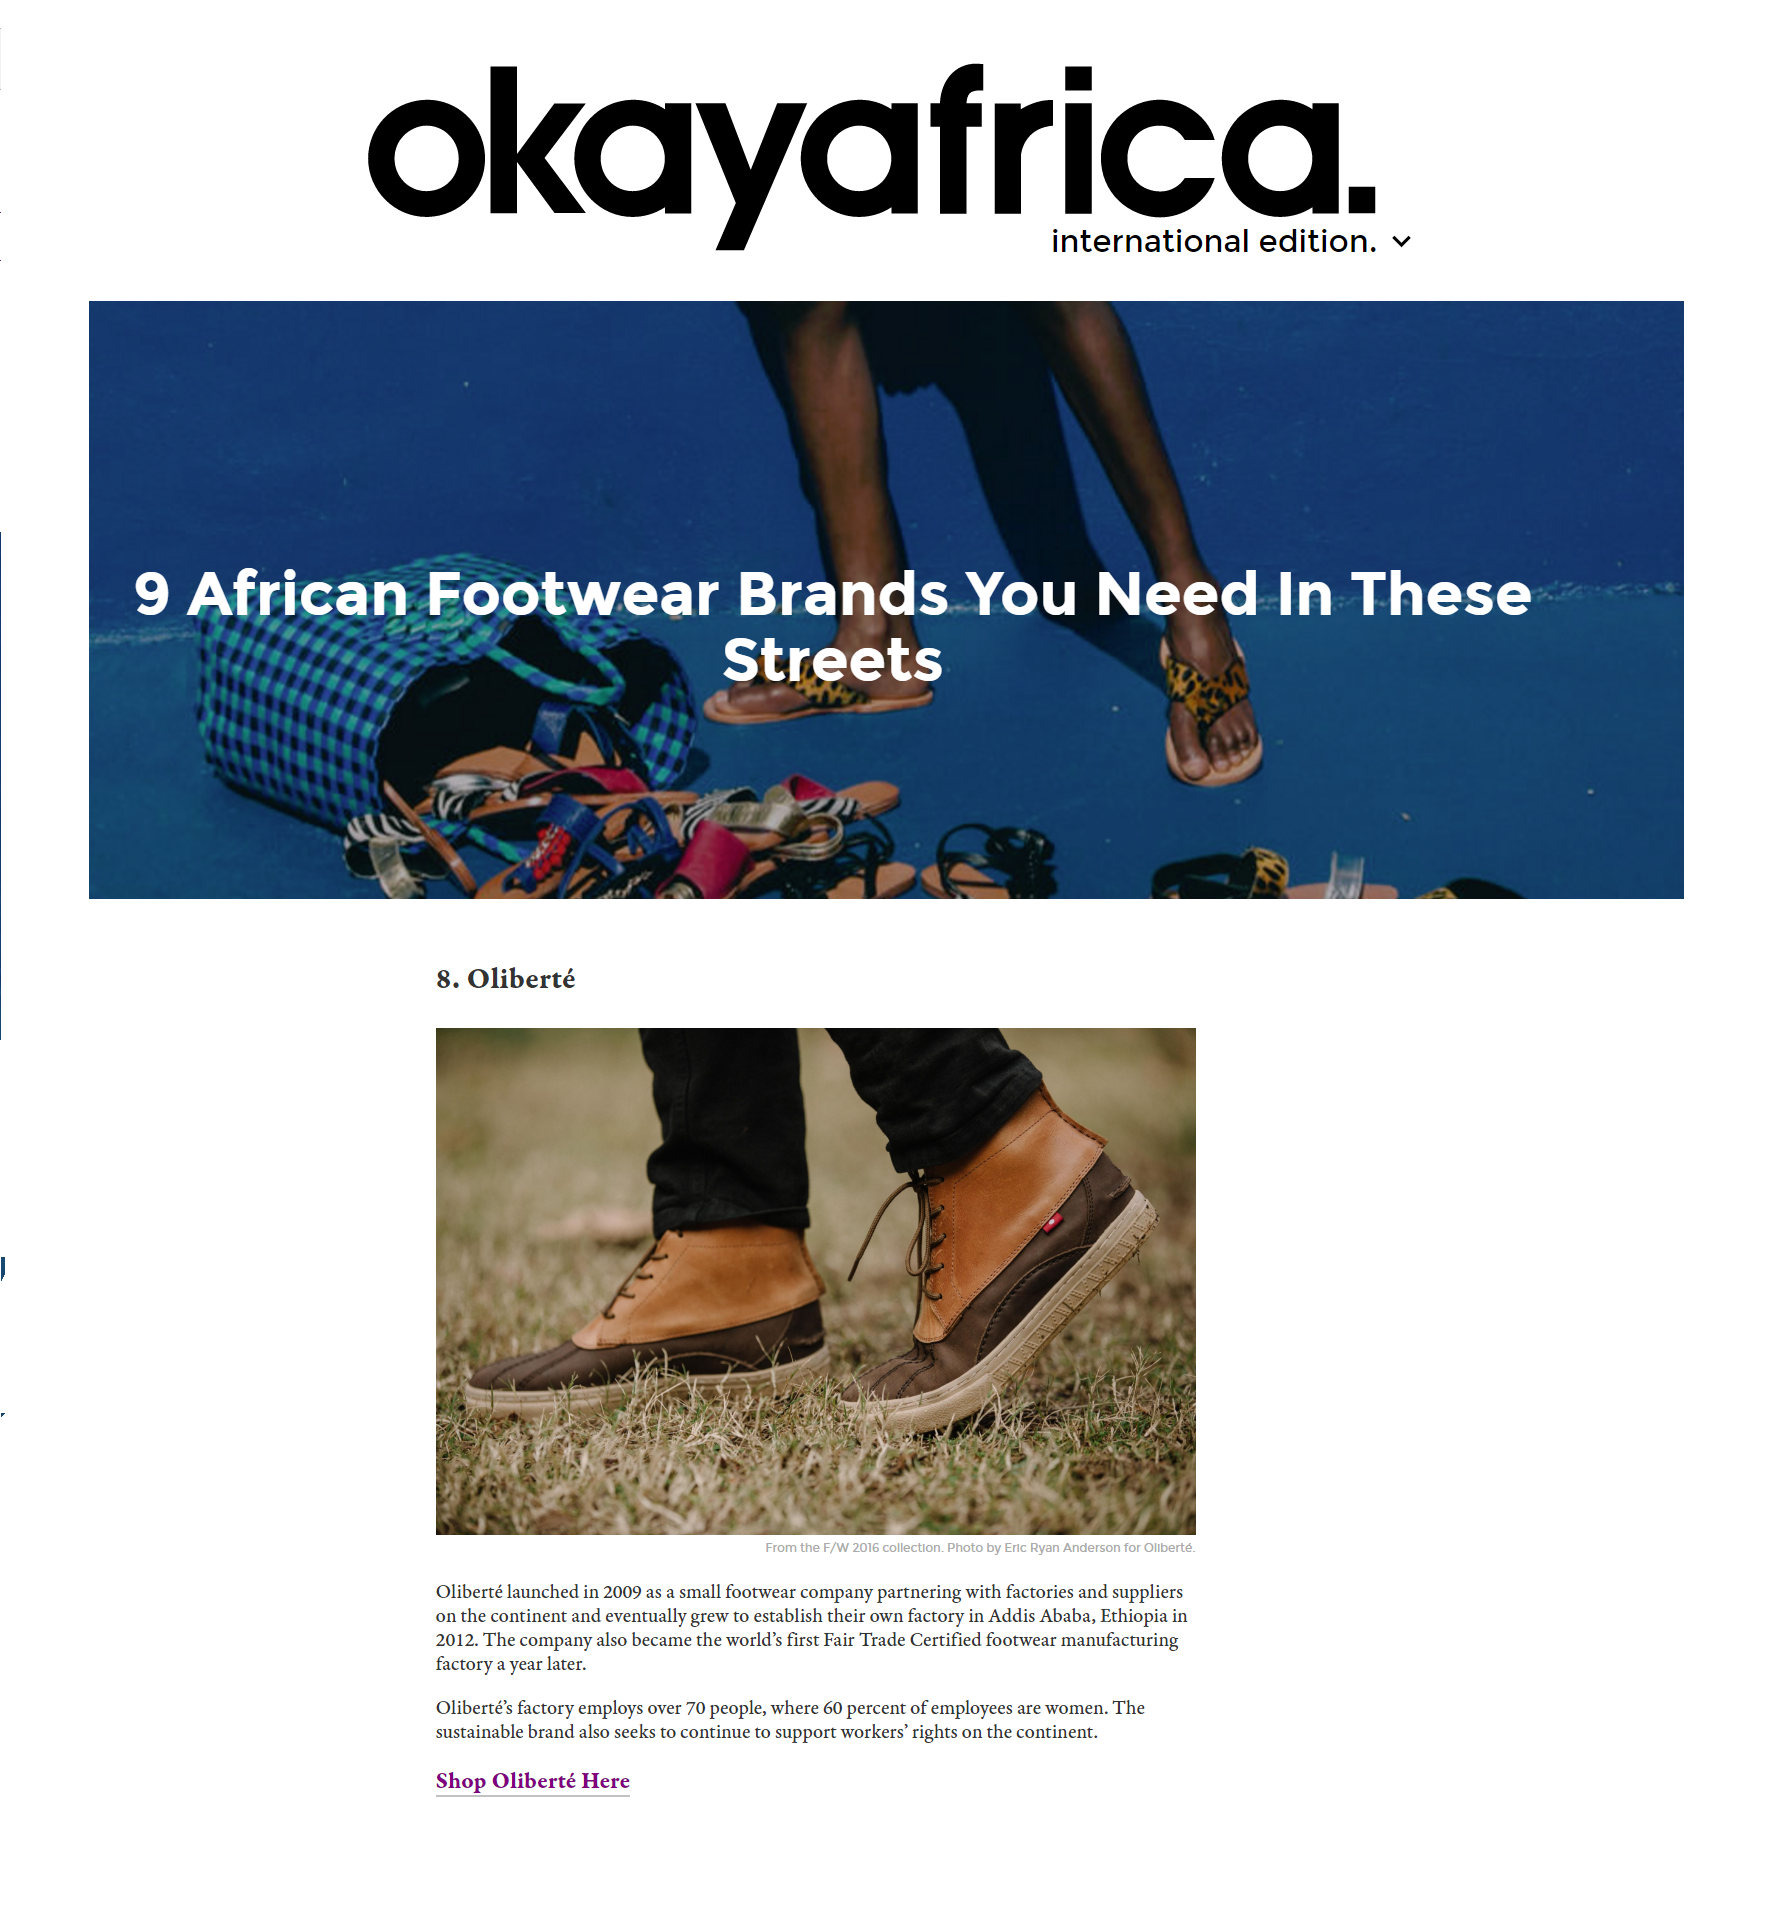 okafrica